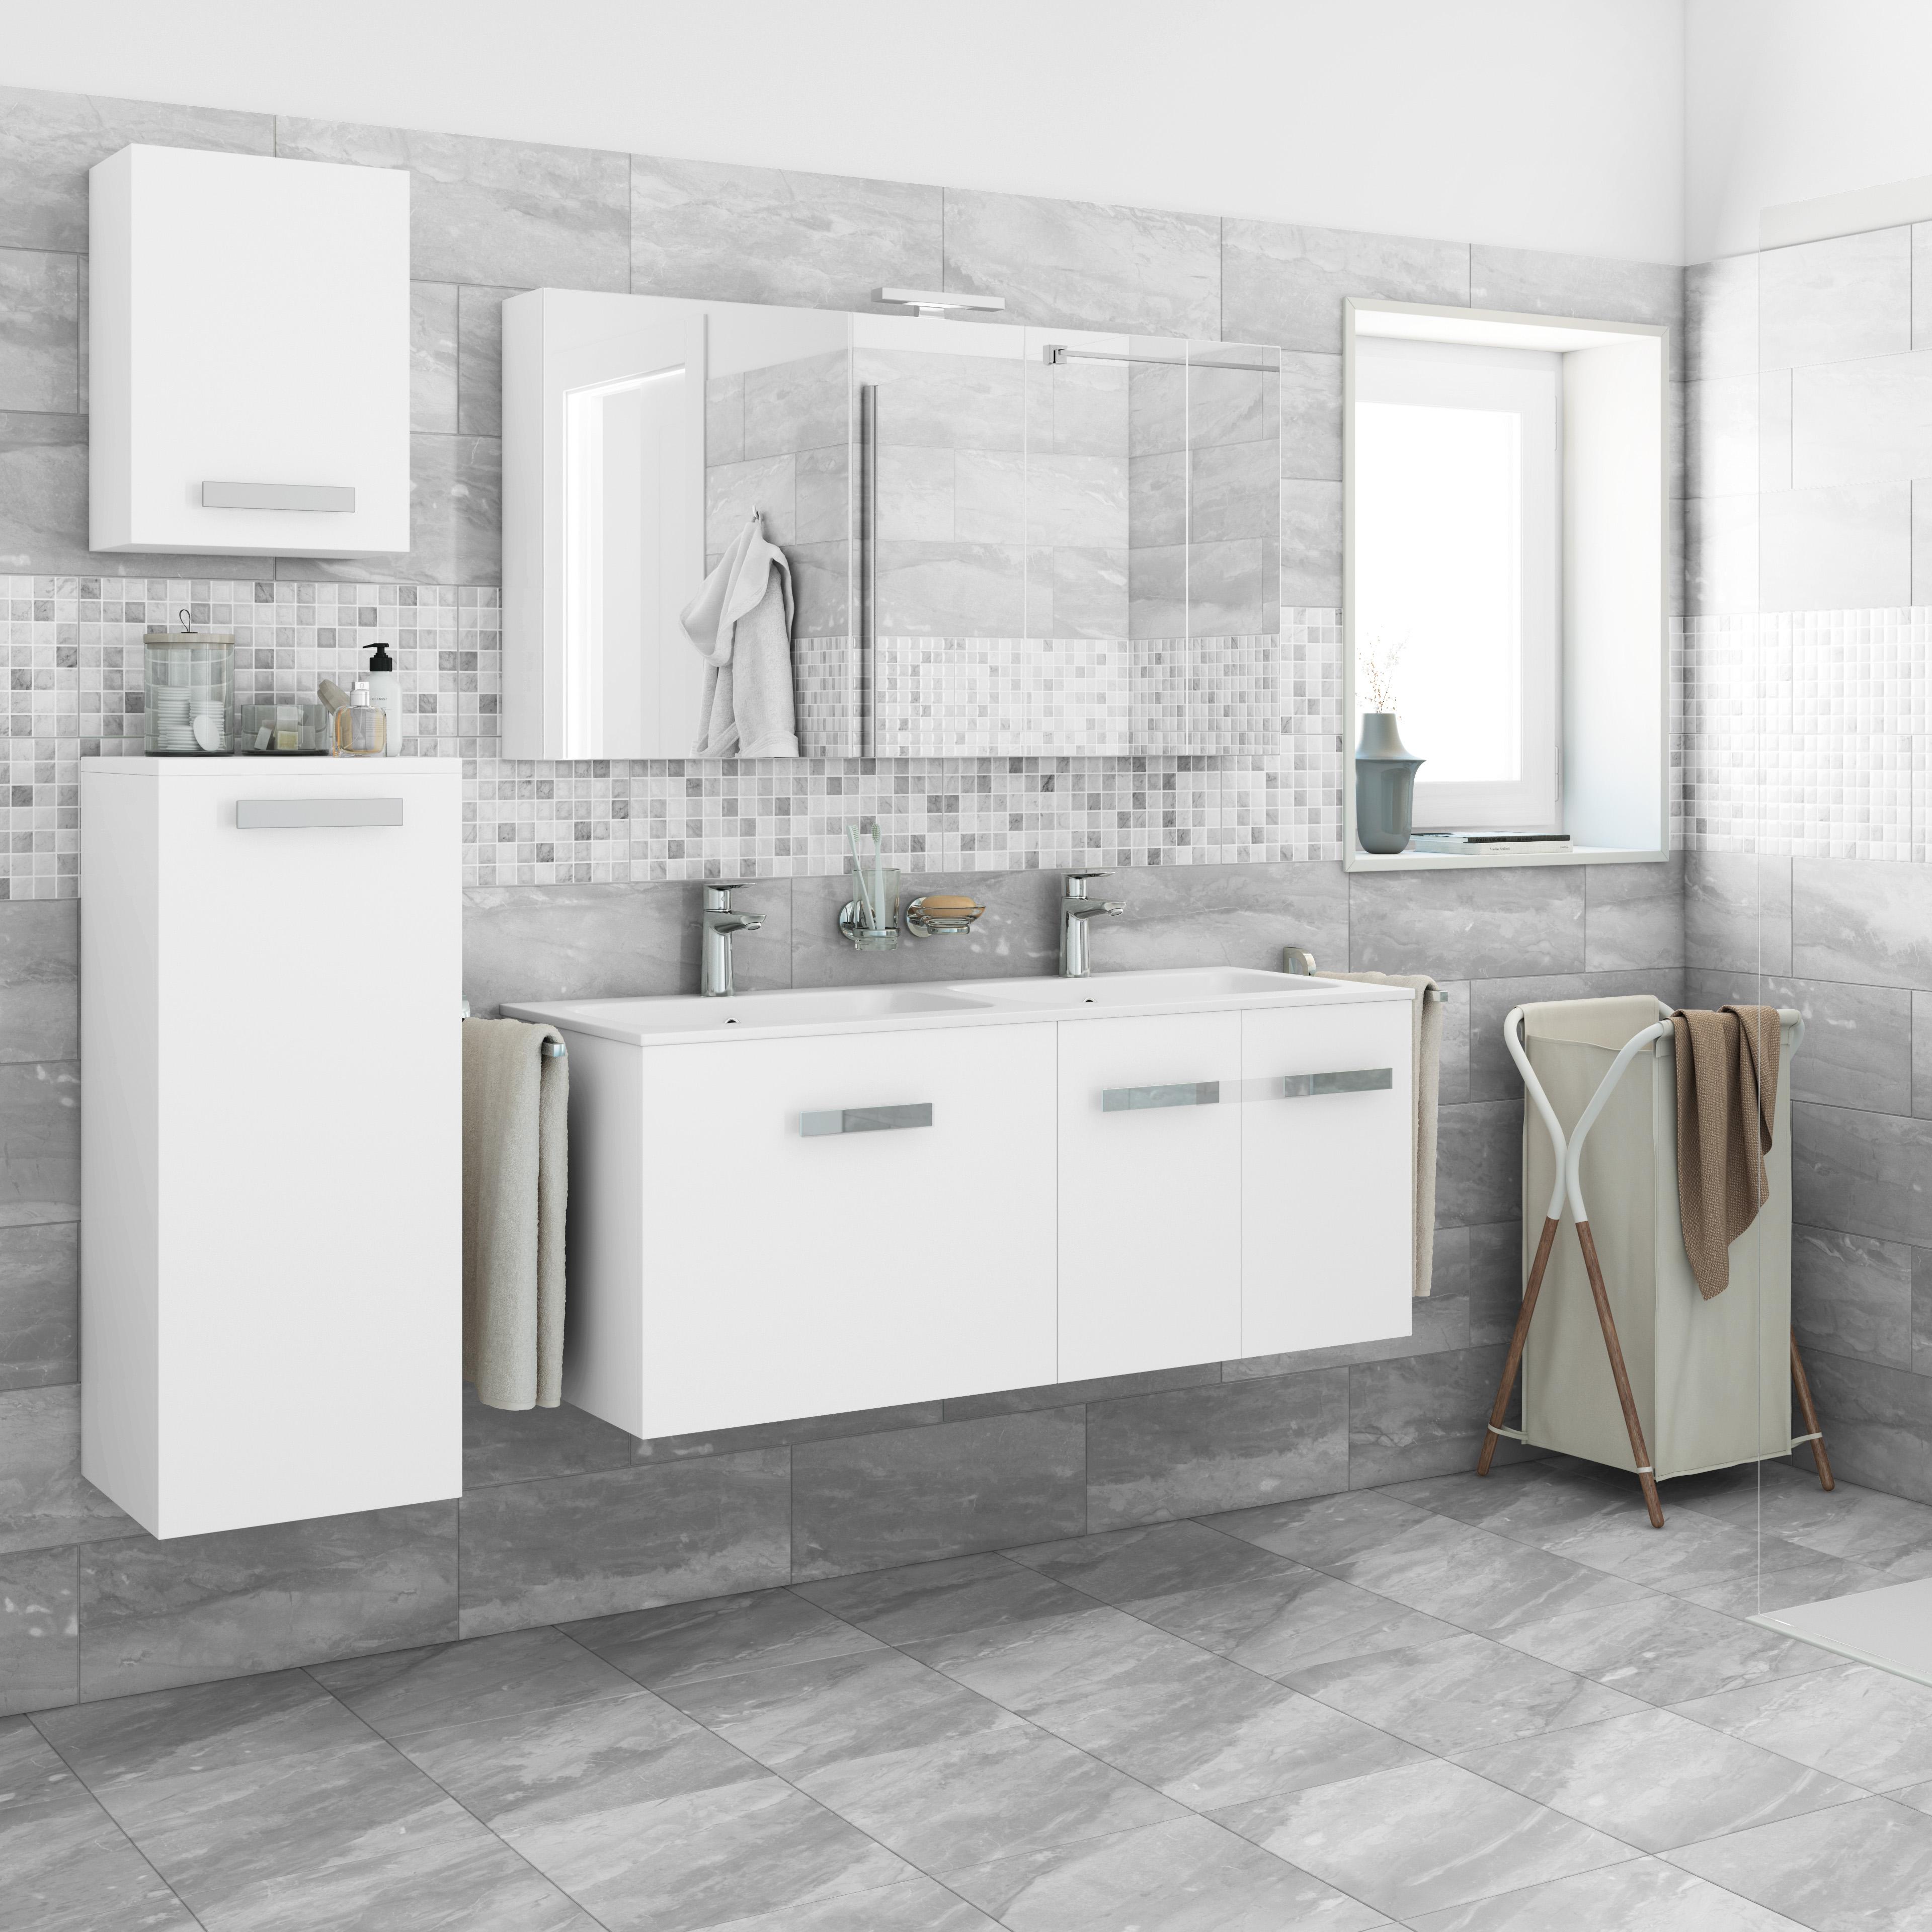 Mobili bagno curvi for Mobile bagno bianco